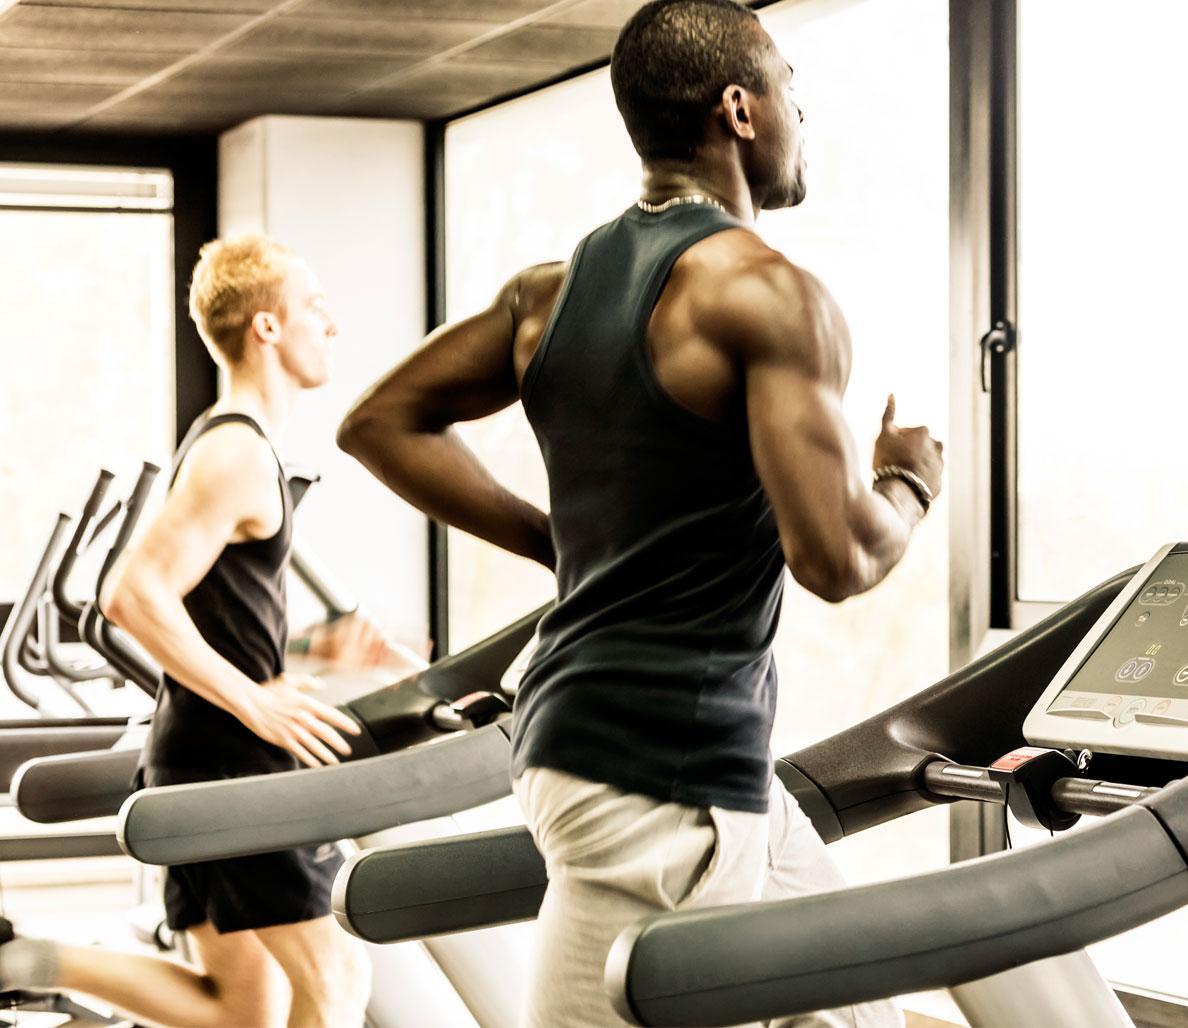 treadmill-workouts-for-anyone-main_0